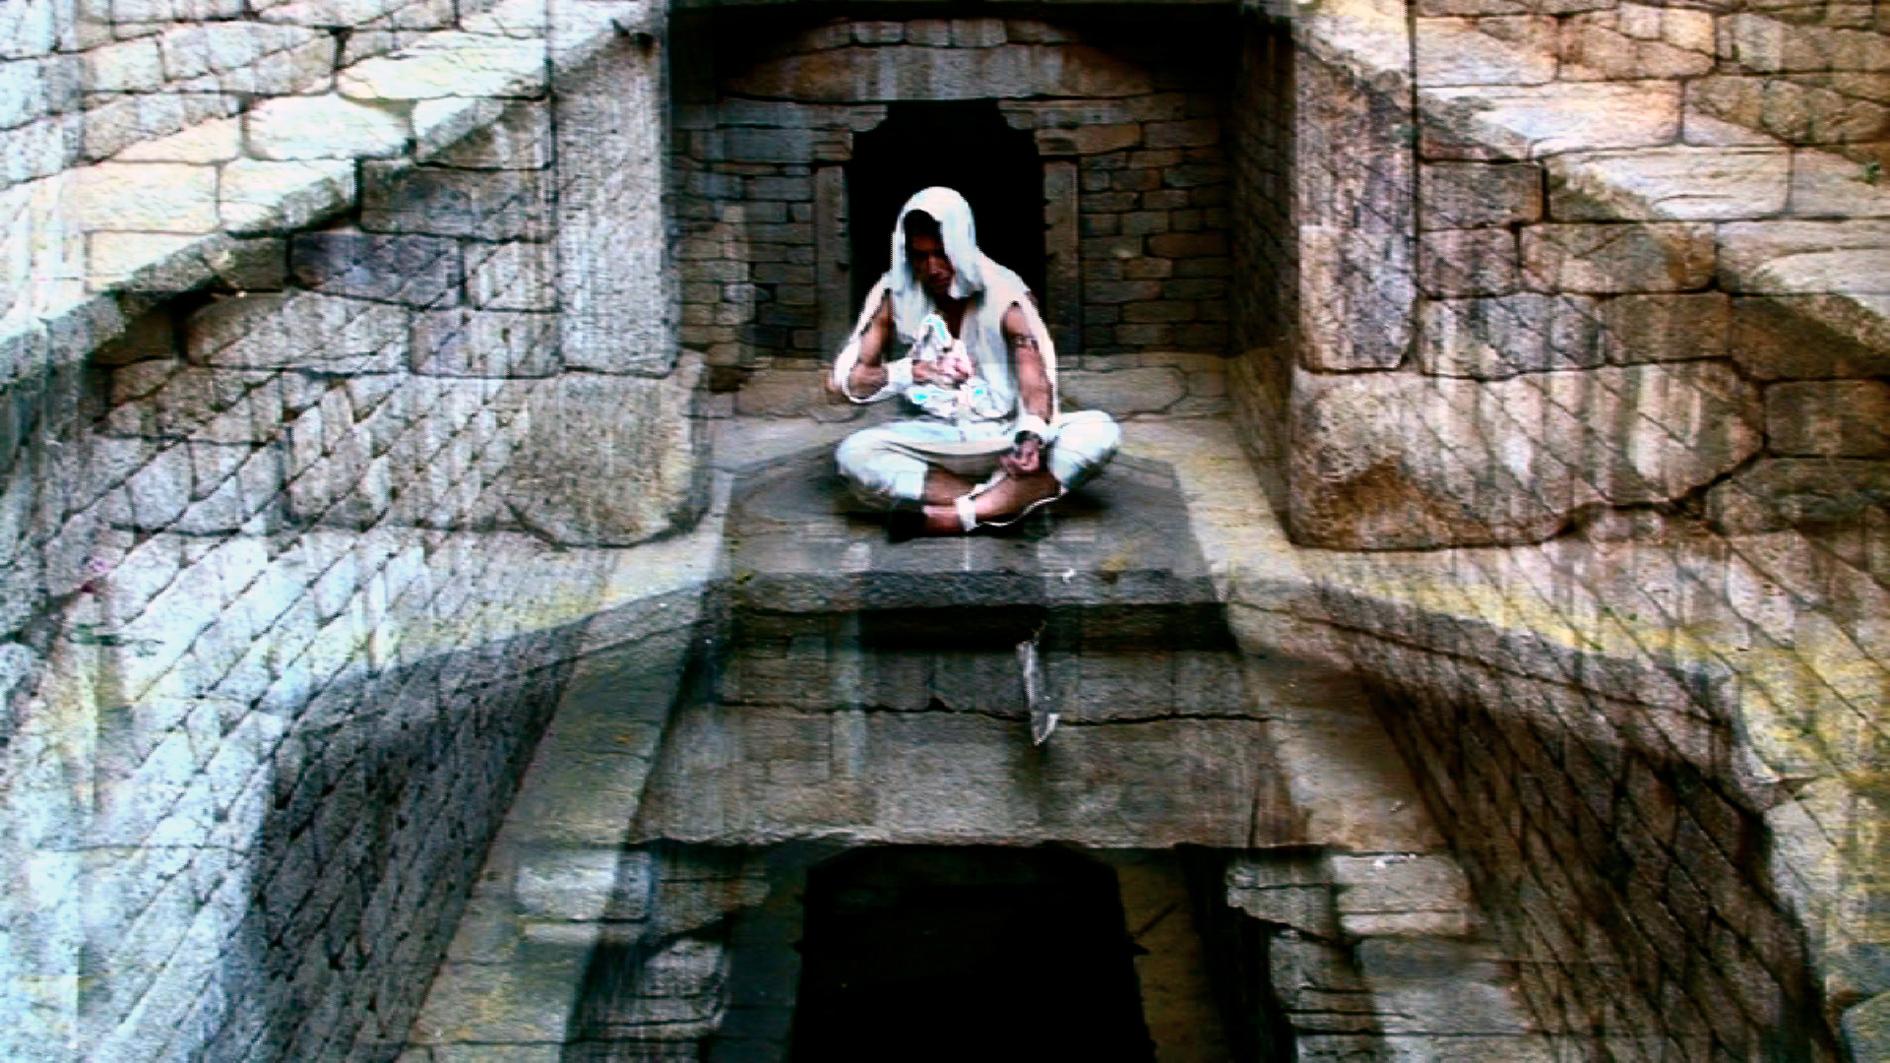 4441_11_VestAndPage_sin.fin.2_India.jpg